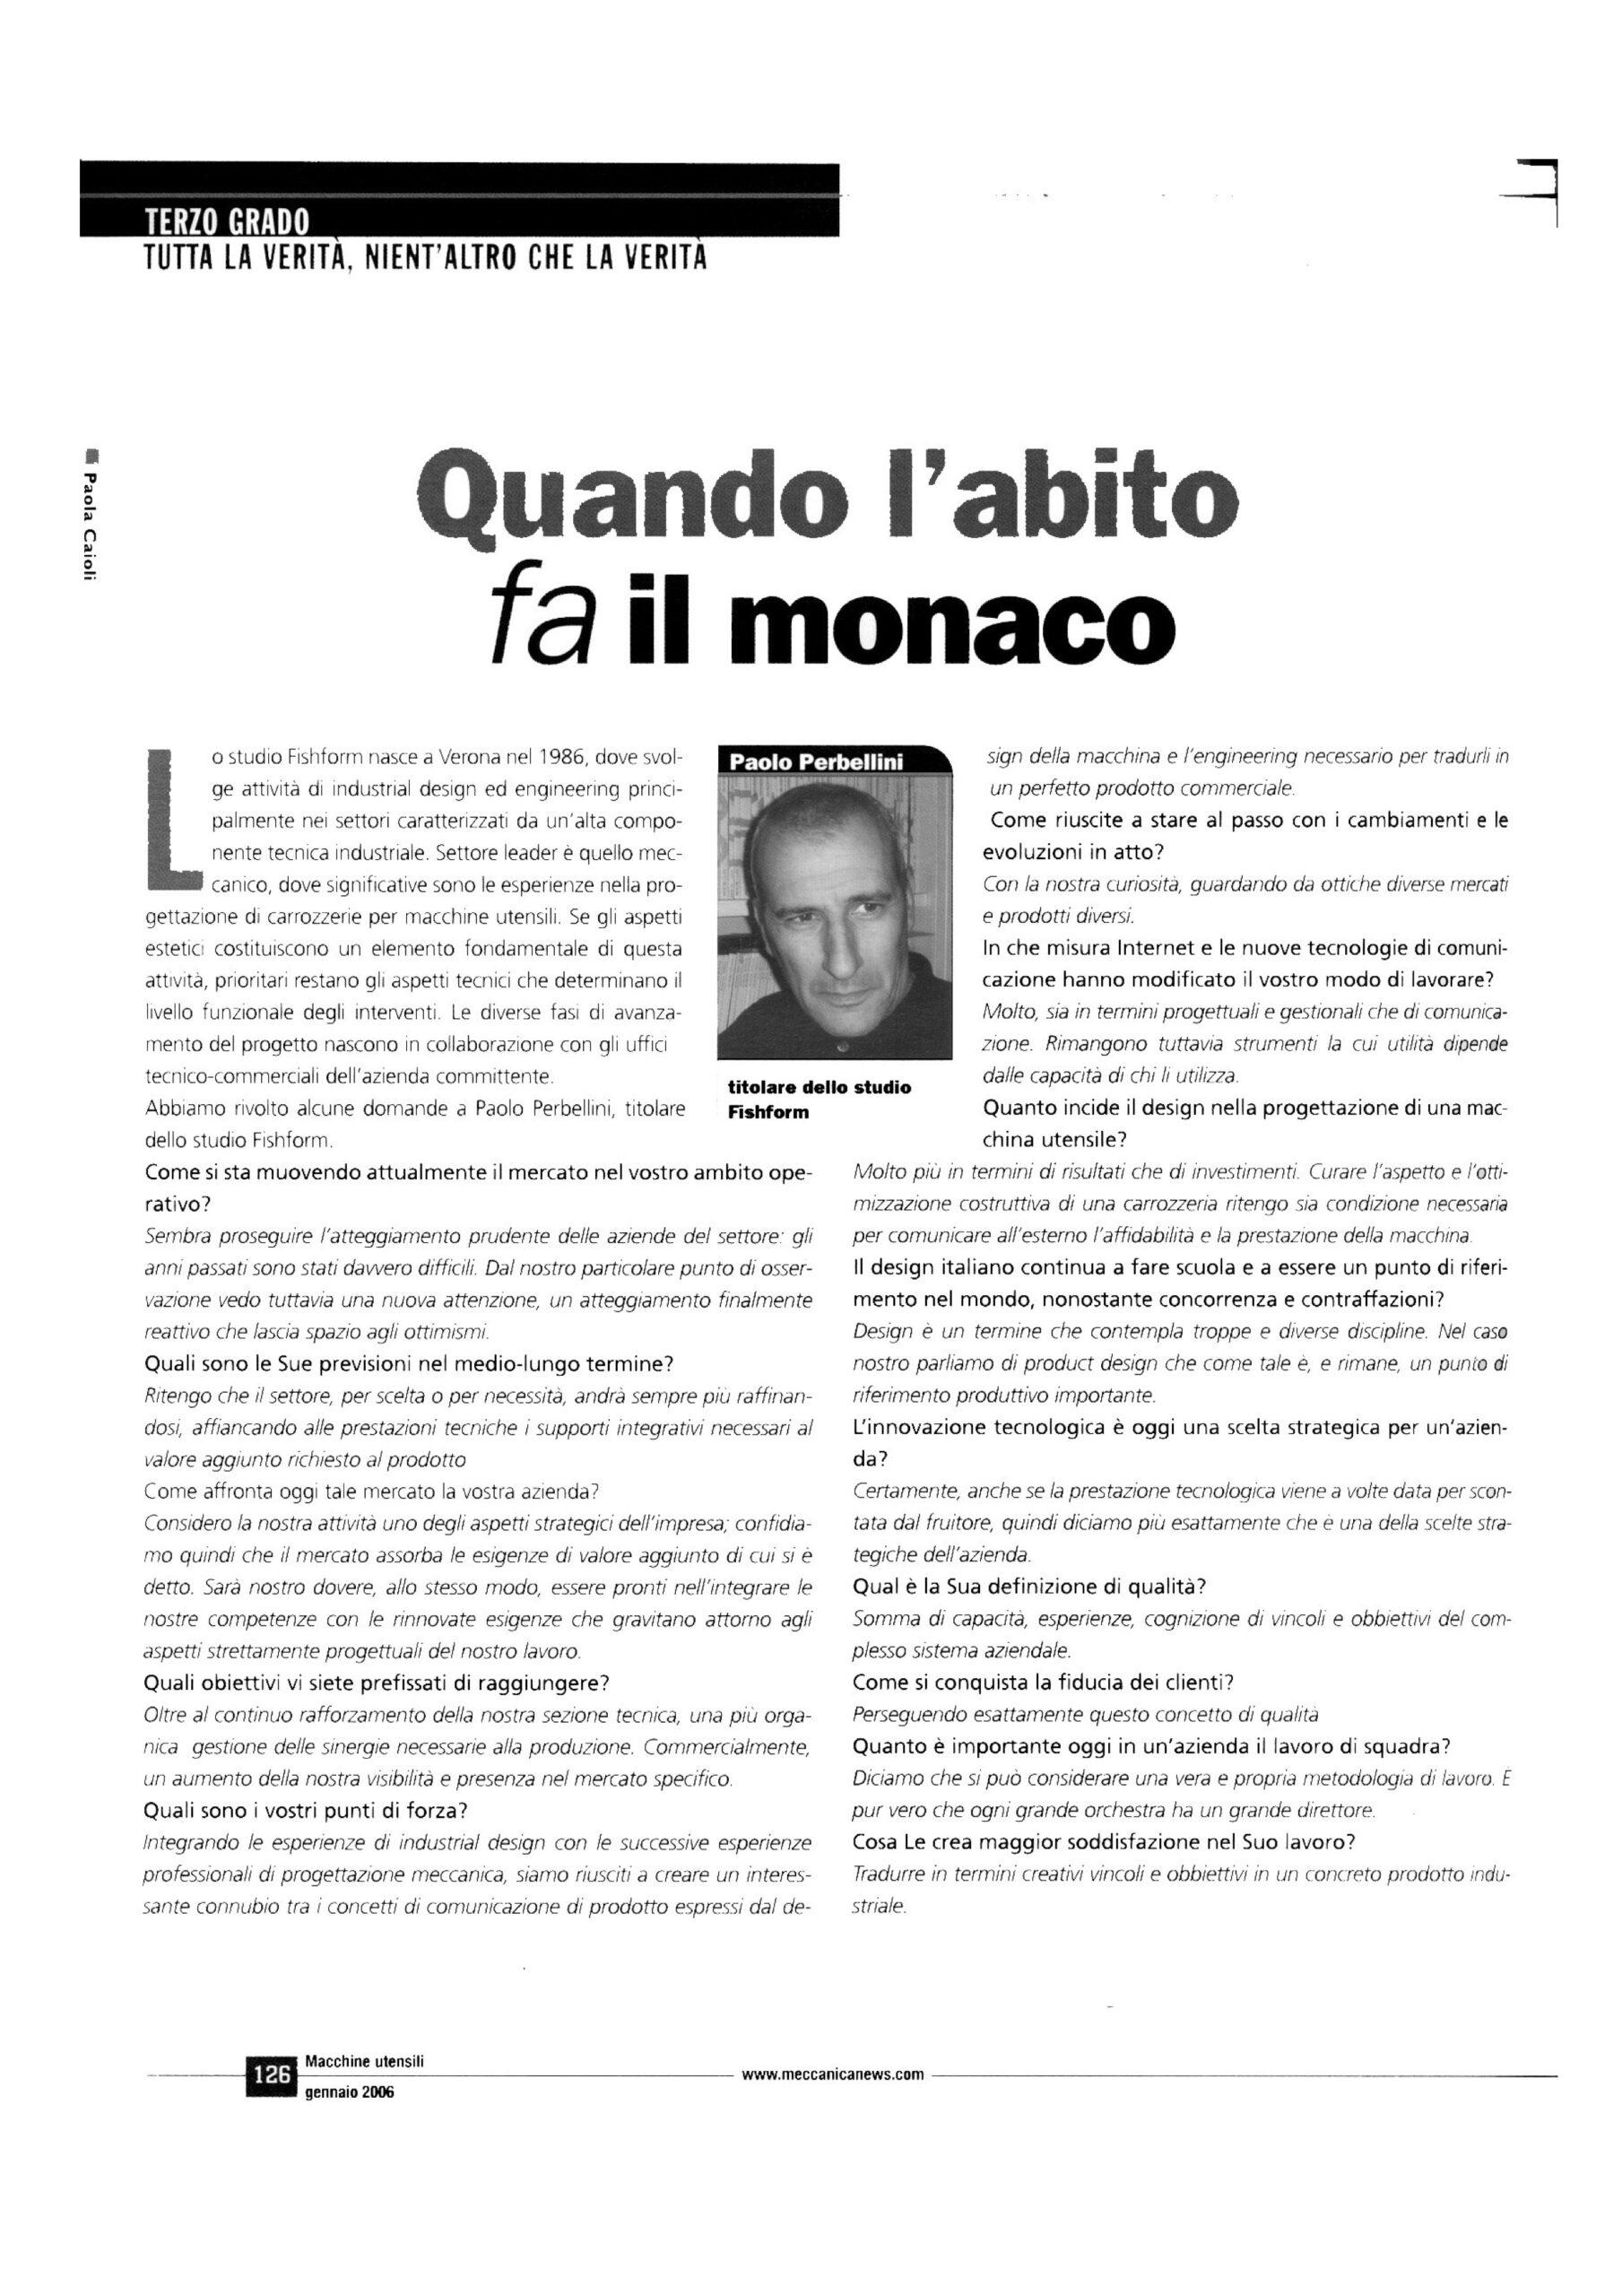 Macchine Utensili Intervista Gennaio 2006